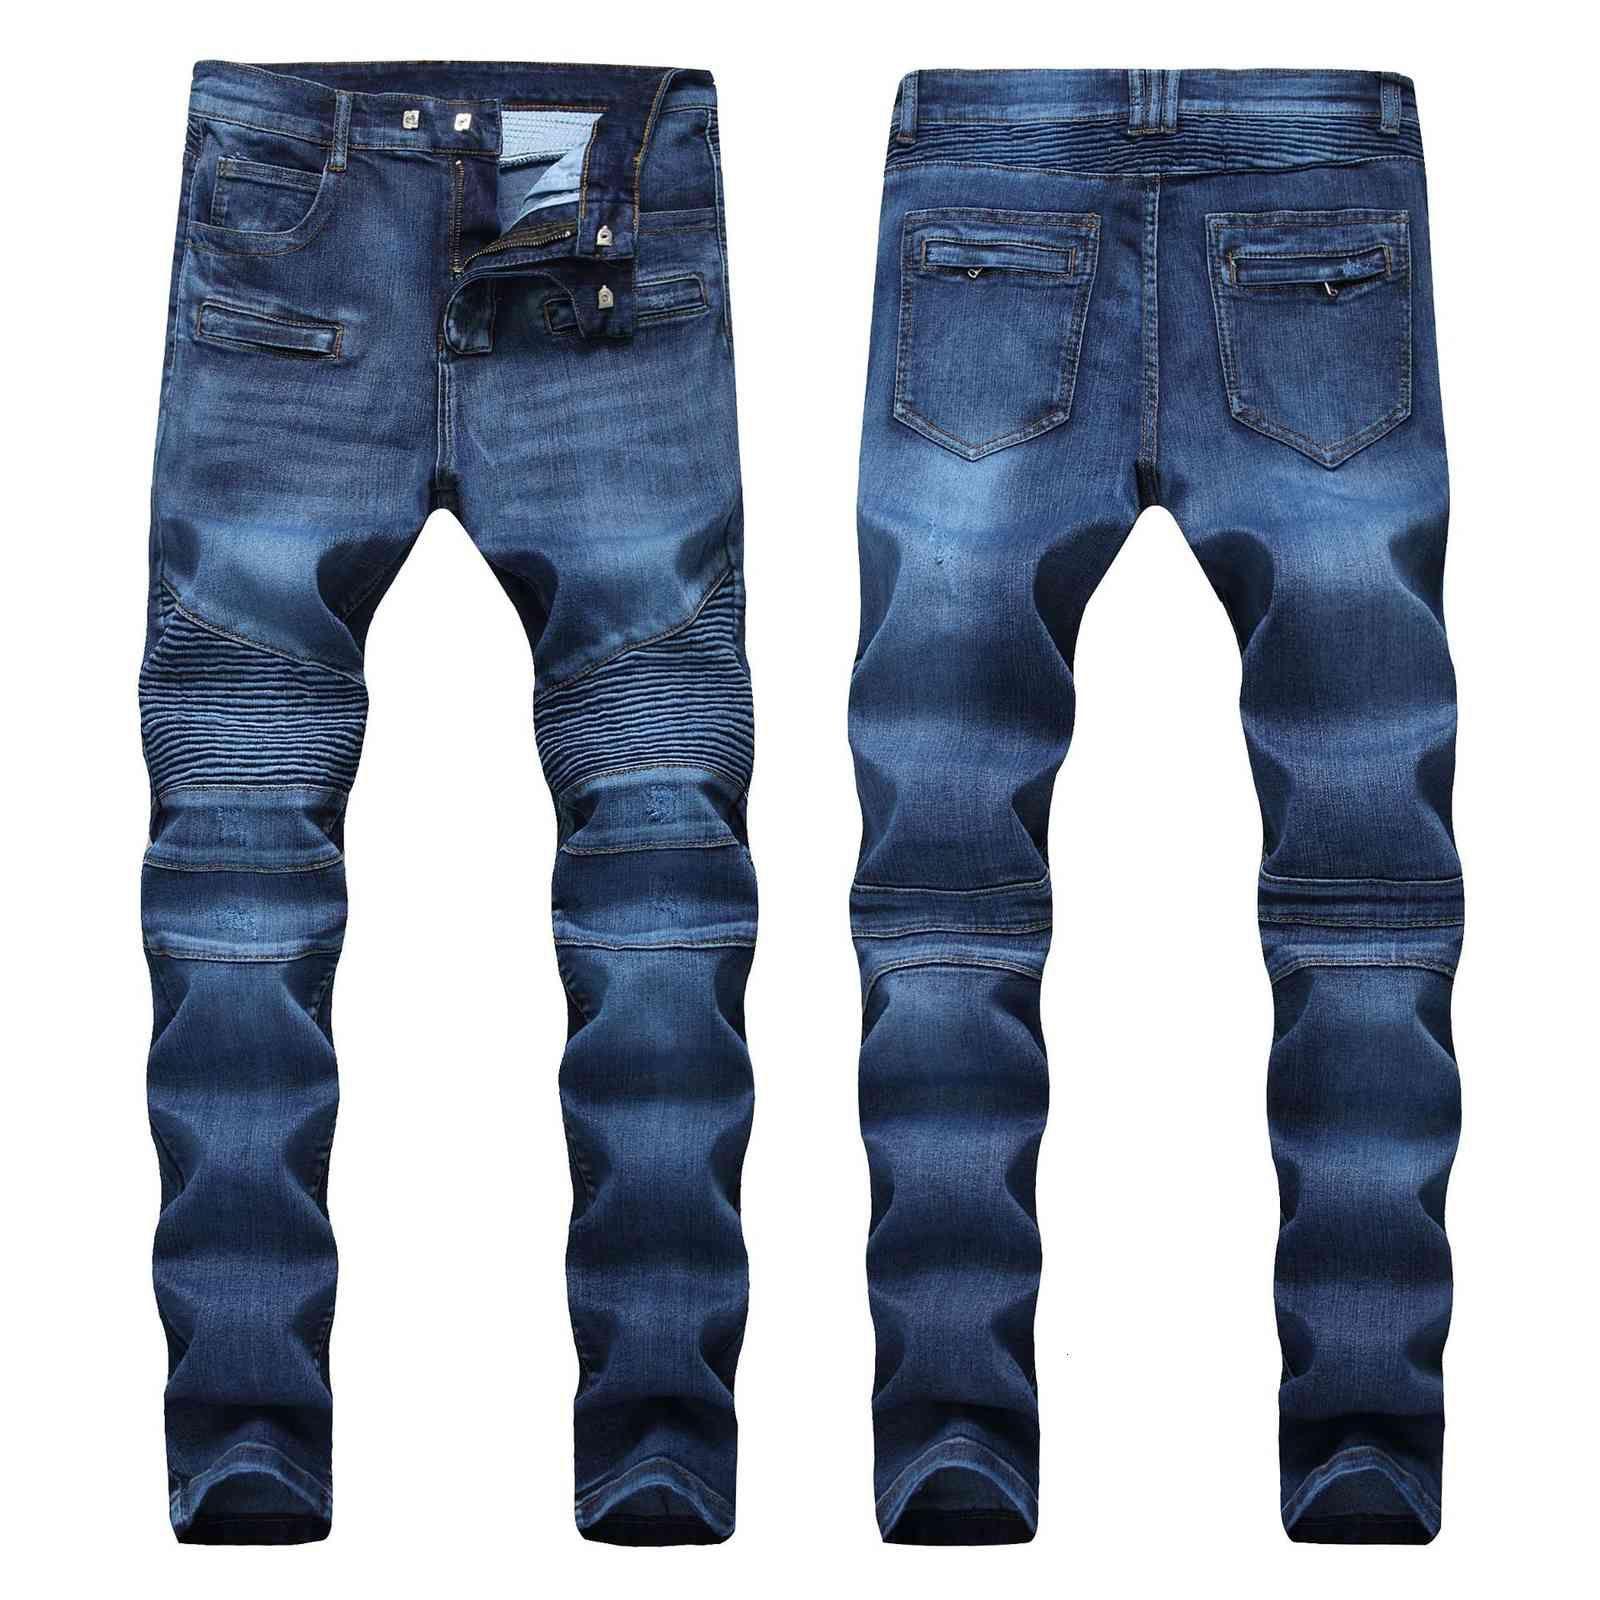 Erkekler Jeans Sıkıntılı Skinny Moda Ince Motosiklet Moto Biker Nedensel Erkek Denim Pantolon Hip Hop